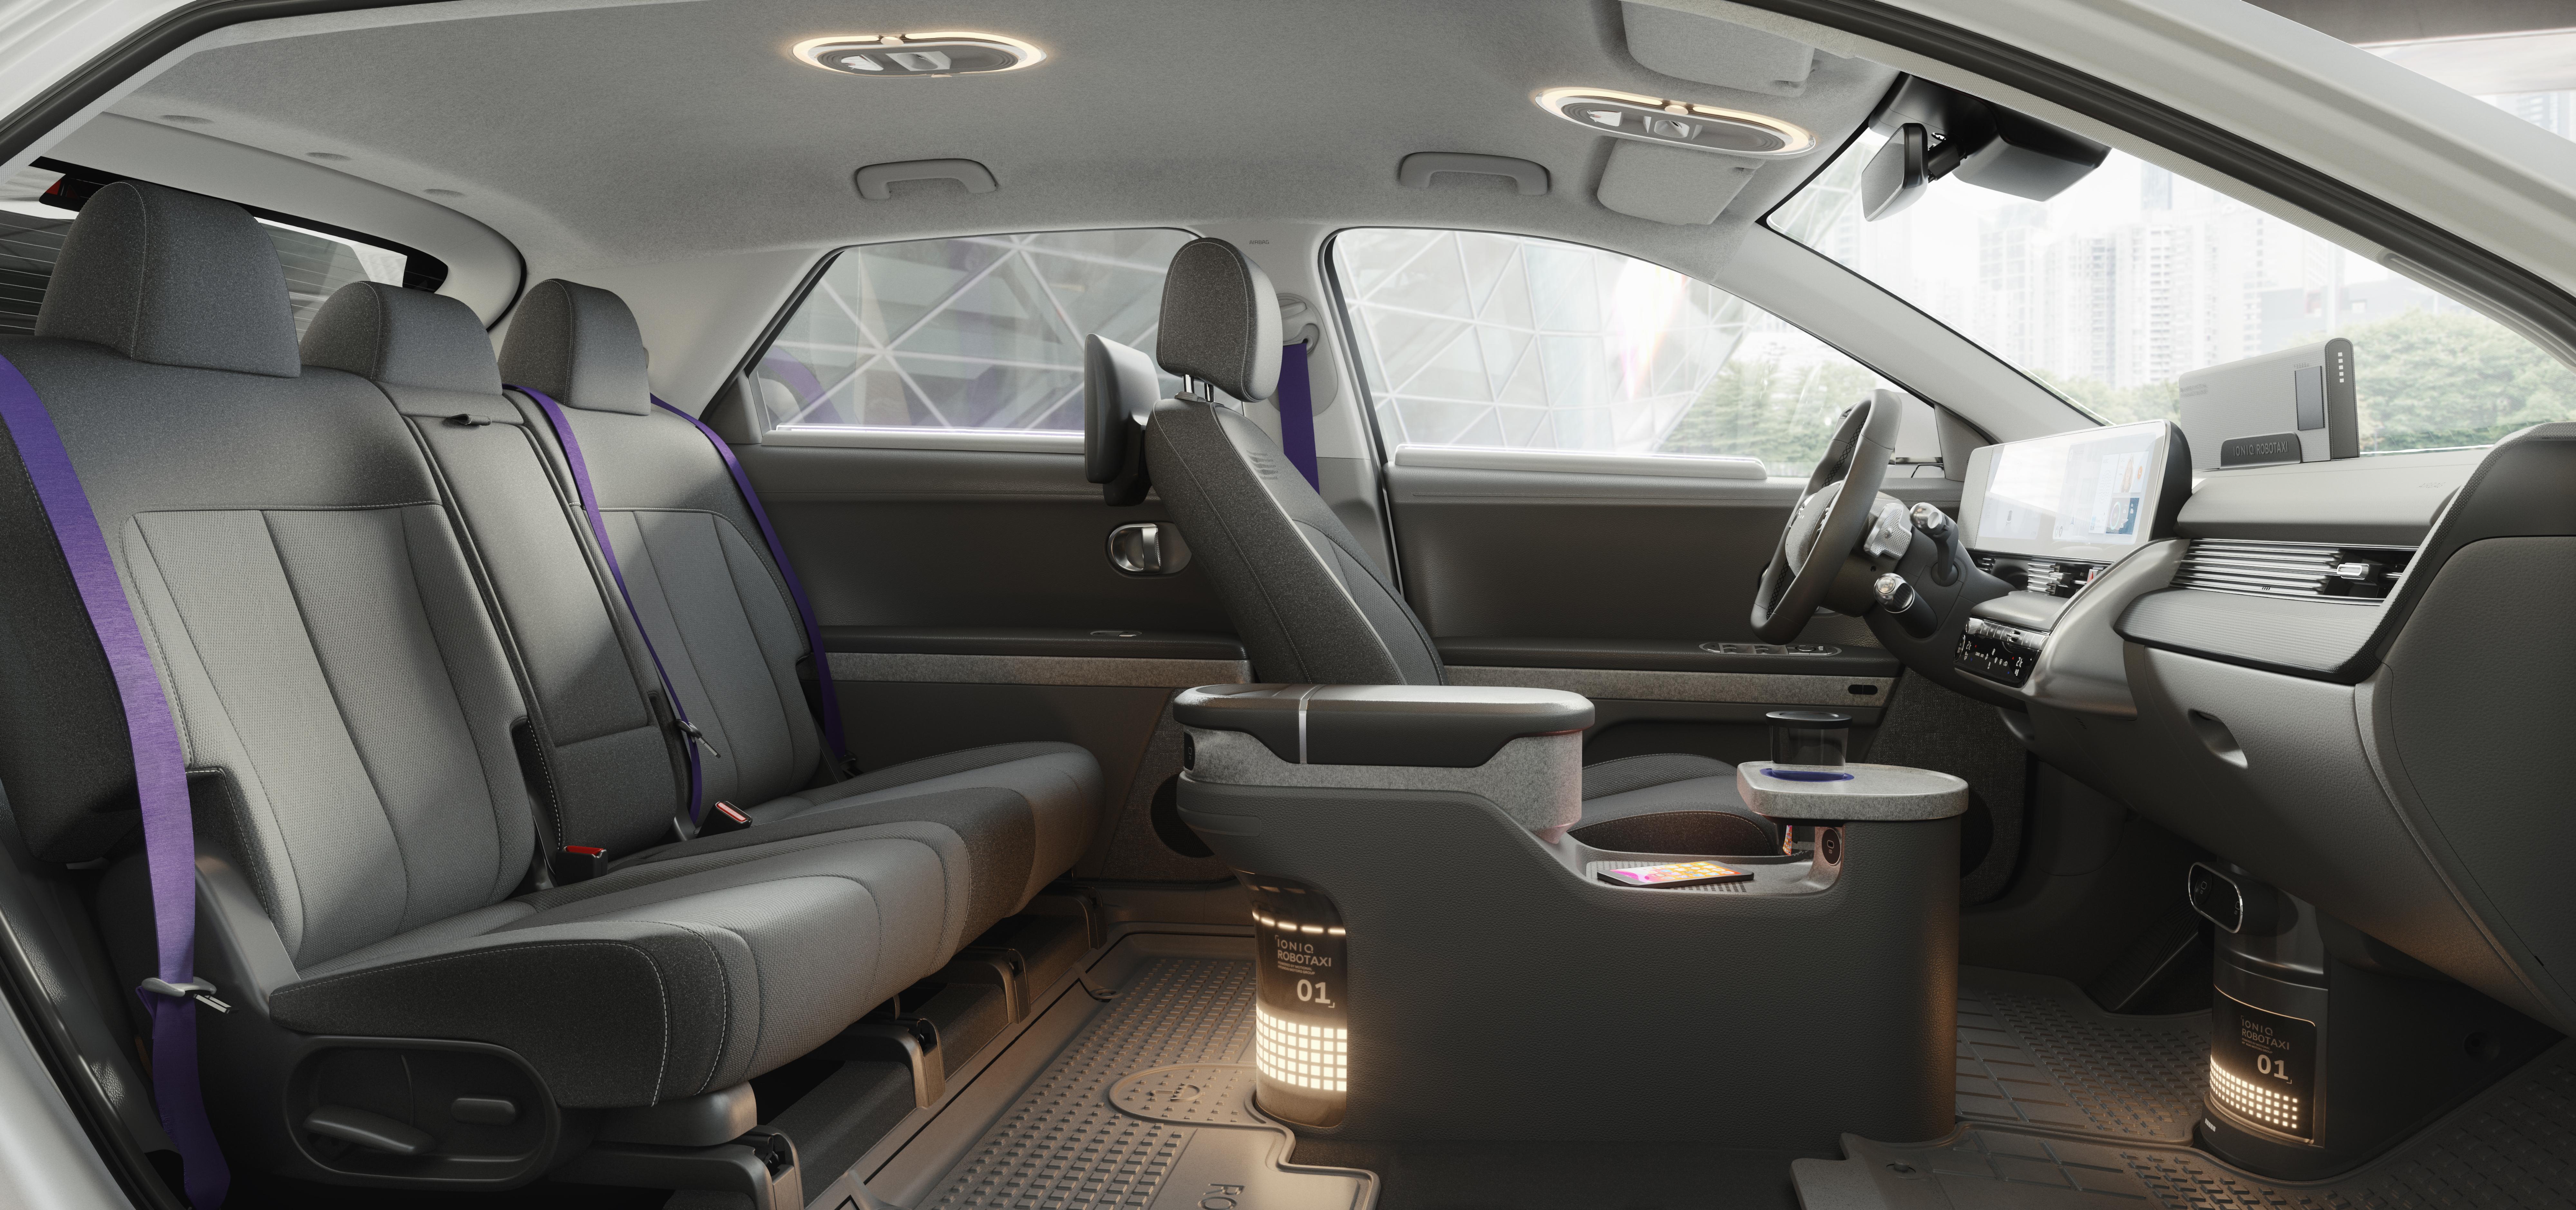 Motional-Hyundai IONIQ 5 Robotaxi